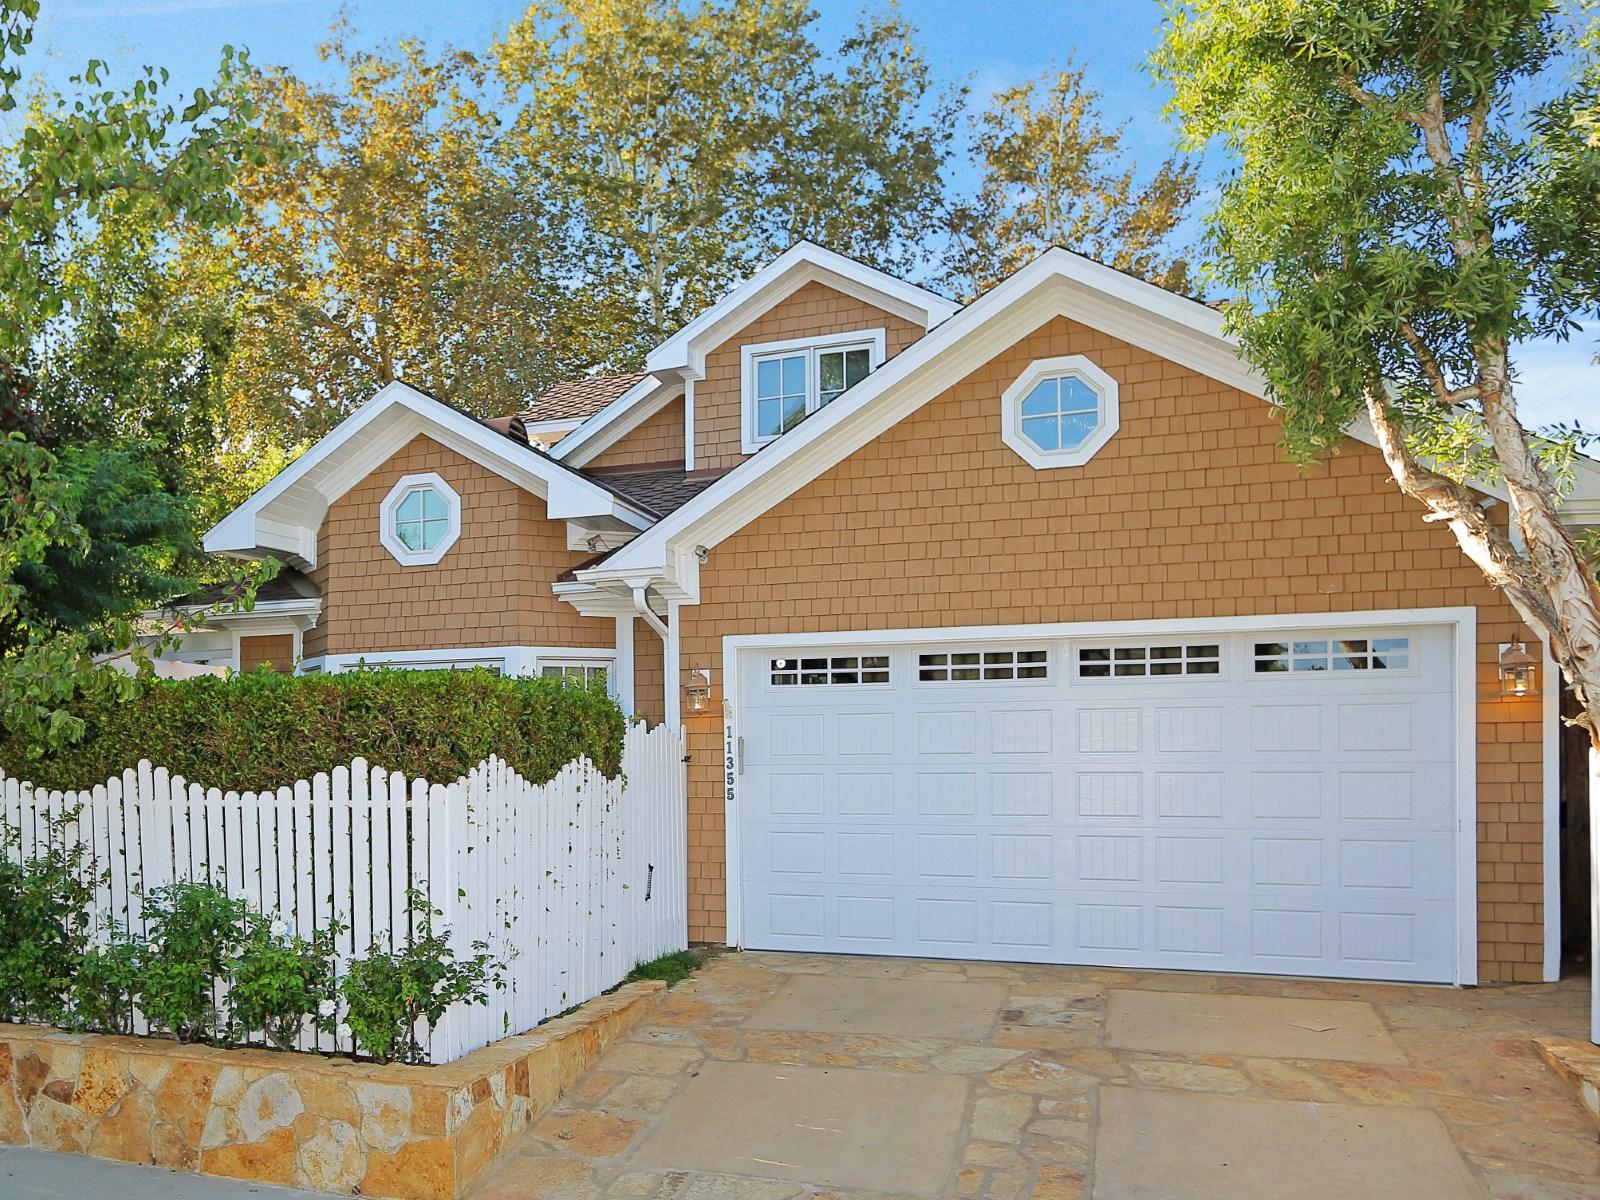 BrentwoodGlen-3BD3BA-1,795,000.jpg